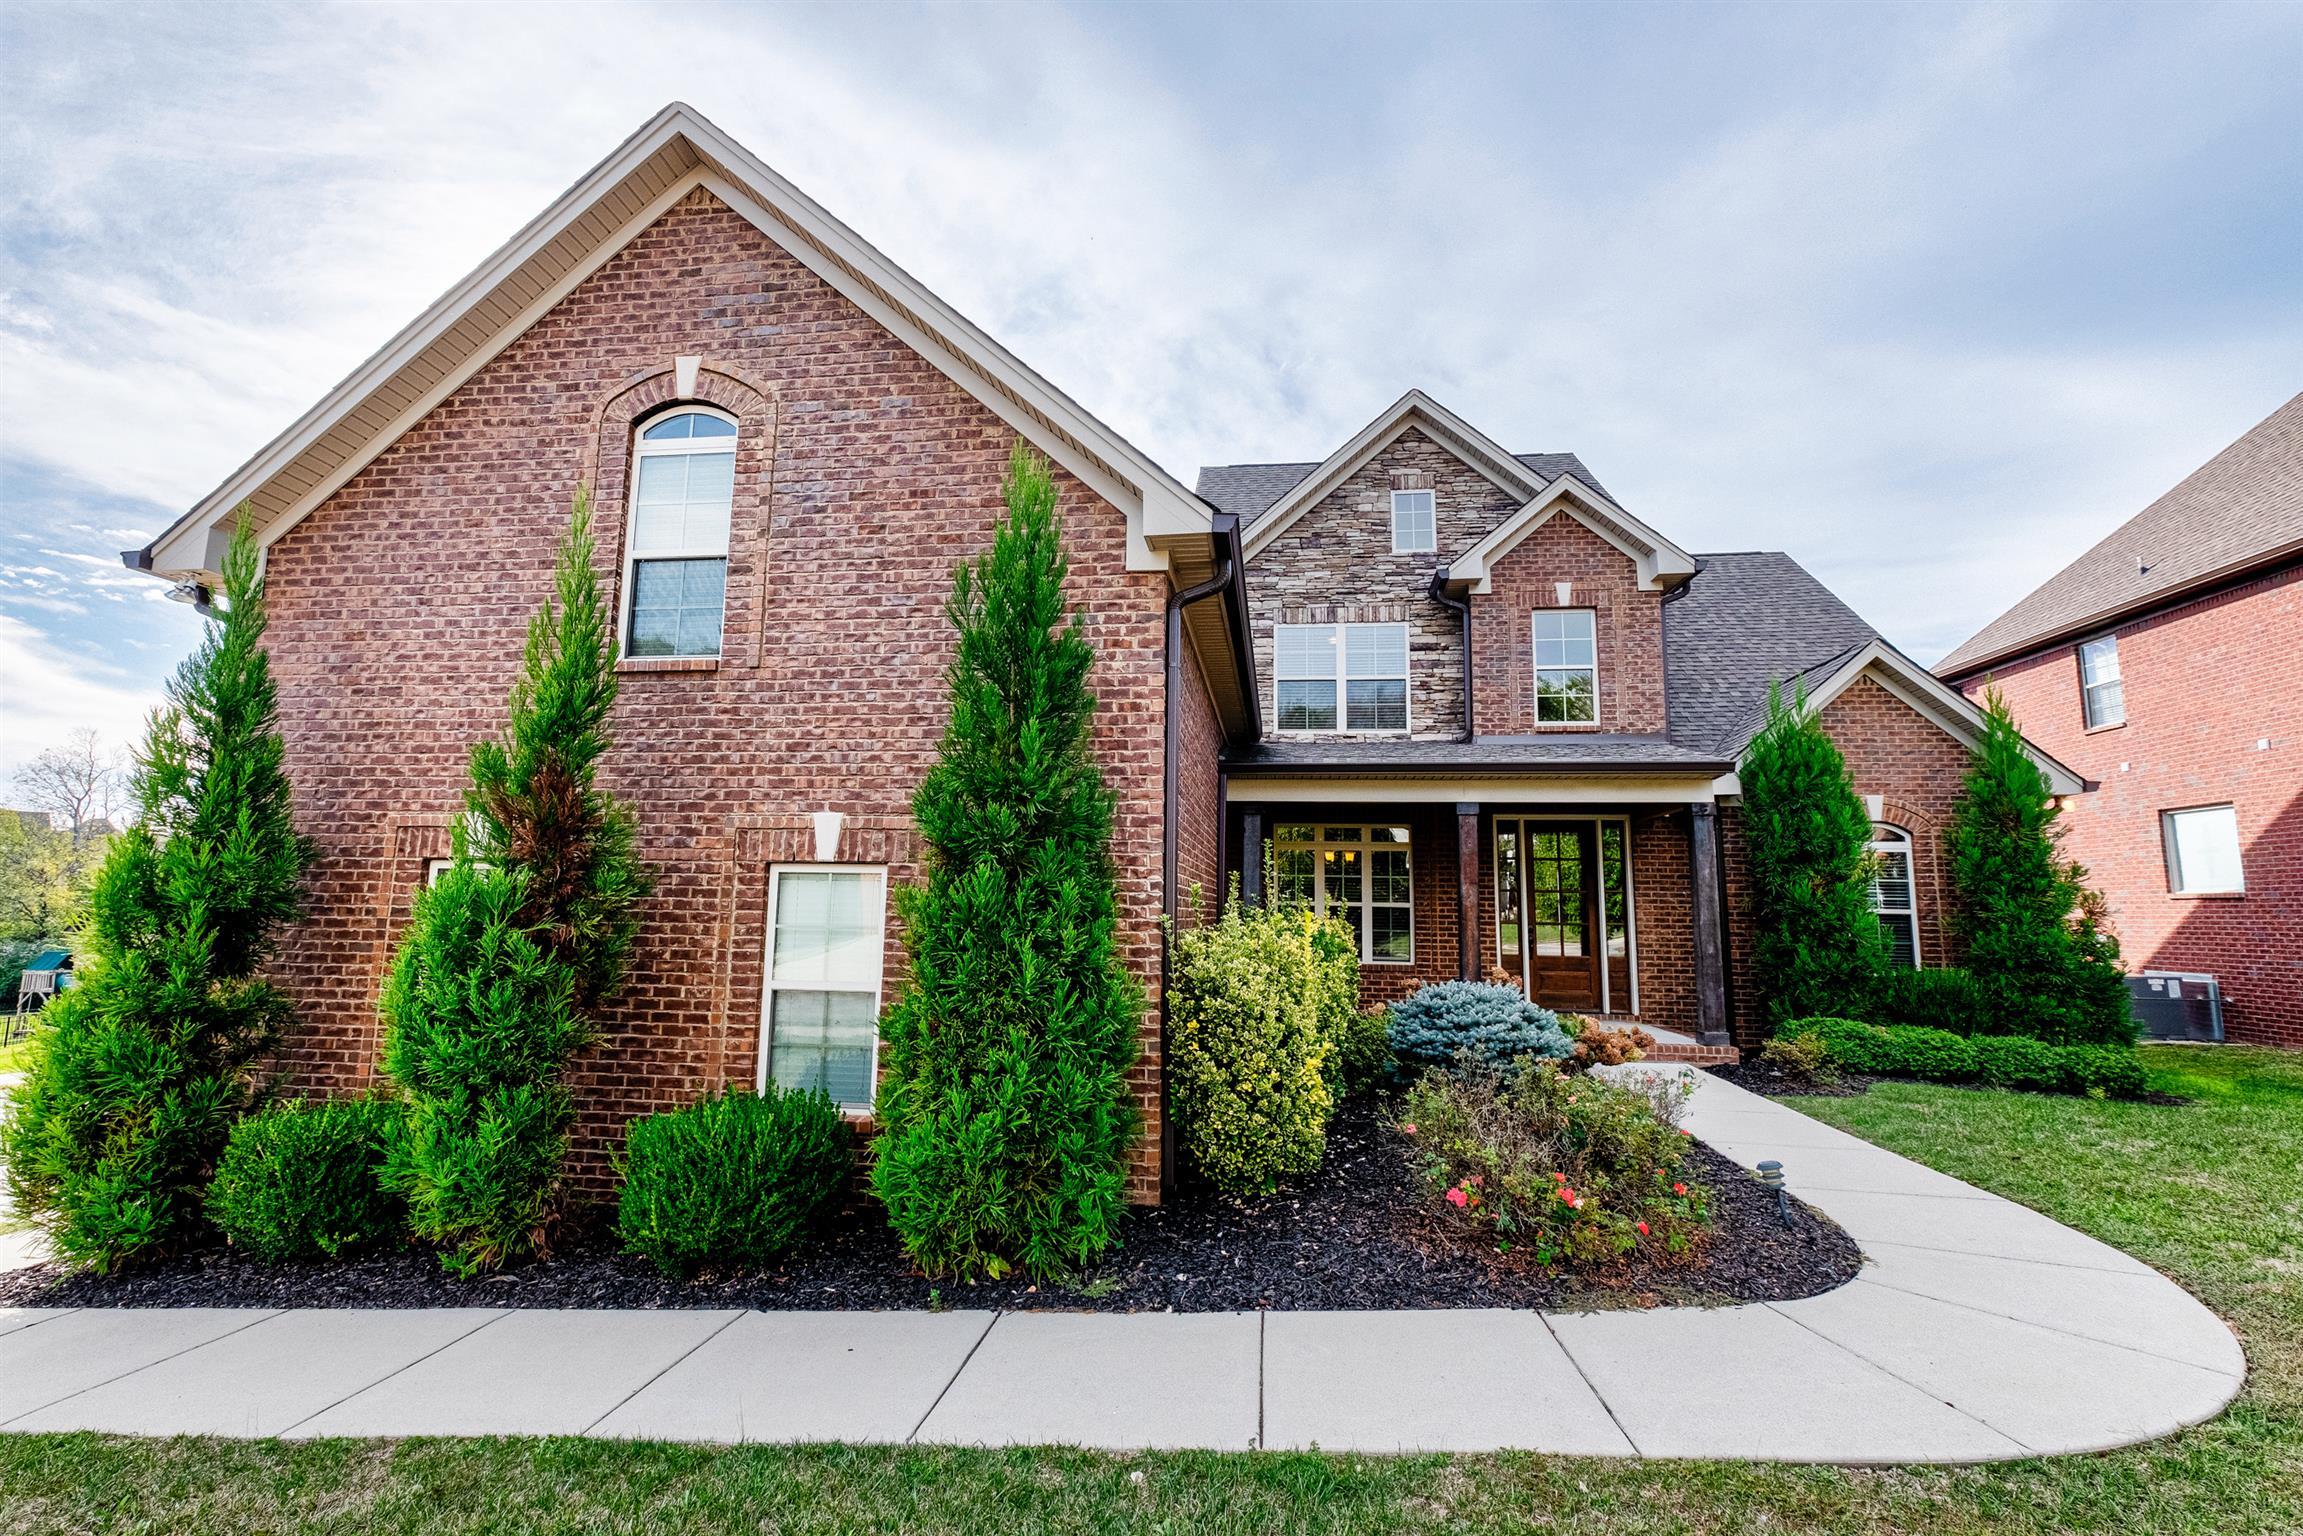 8009 Fenwick Ln, Spring Hill, TN 37174 - Spring Hill, TN real estate listing